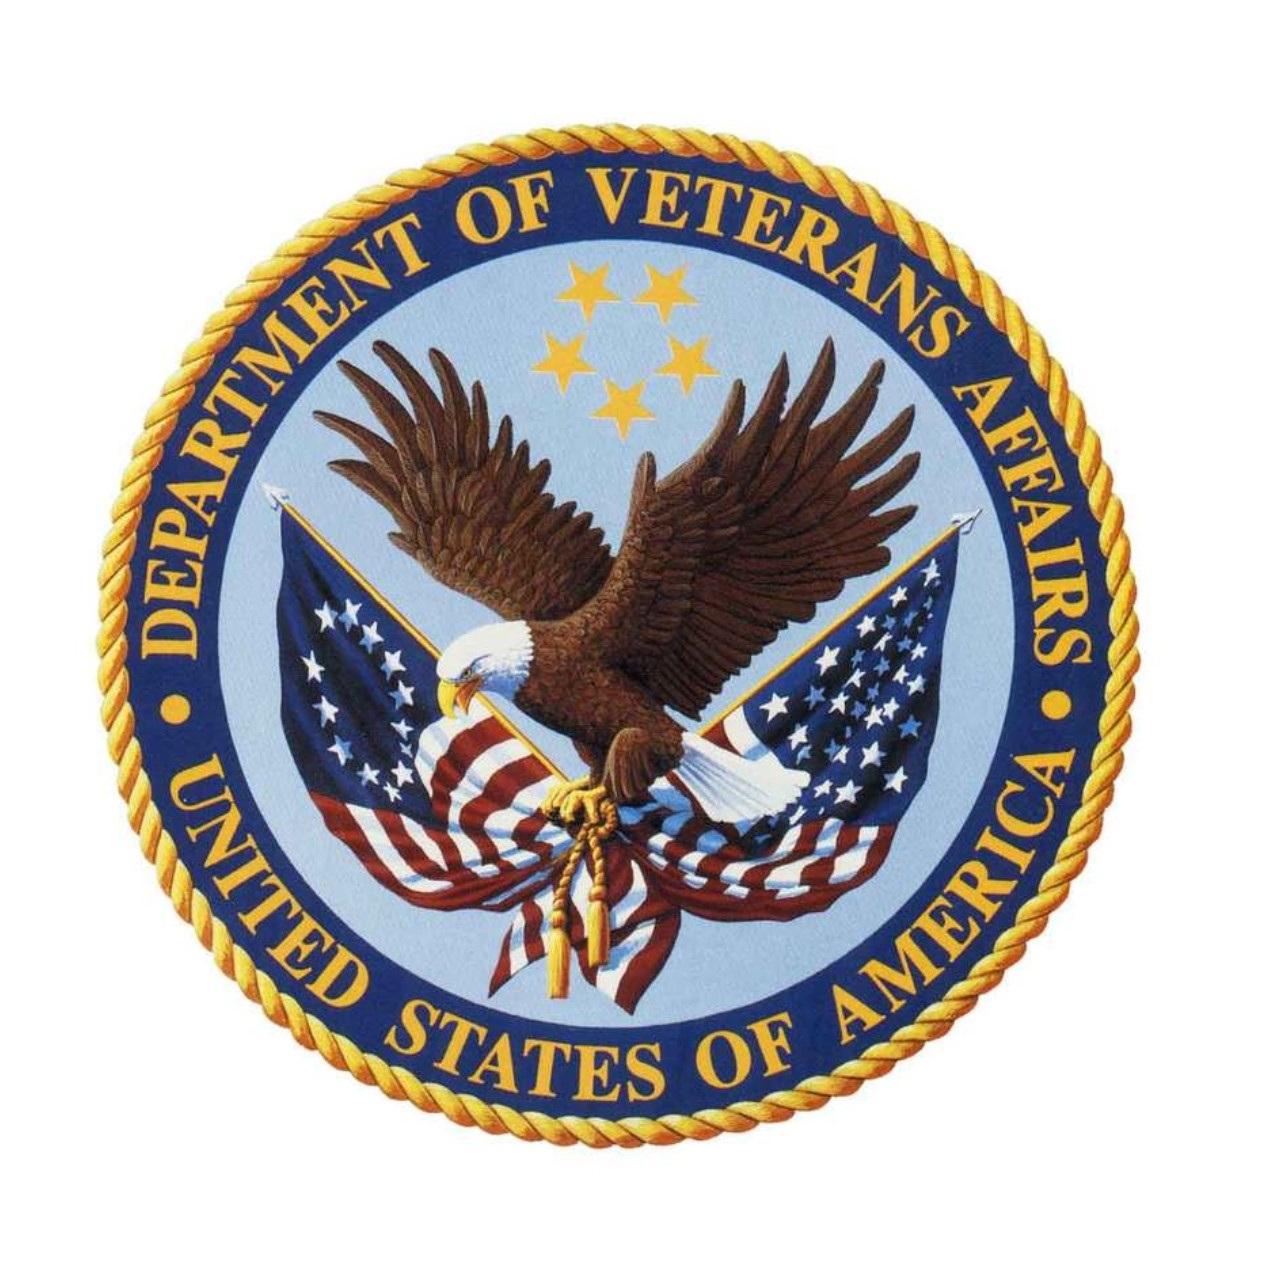 James J. Peters VA Medical Center, Dietetic Internship -